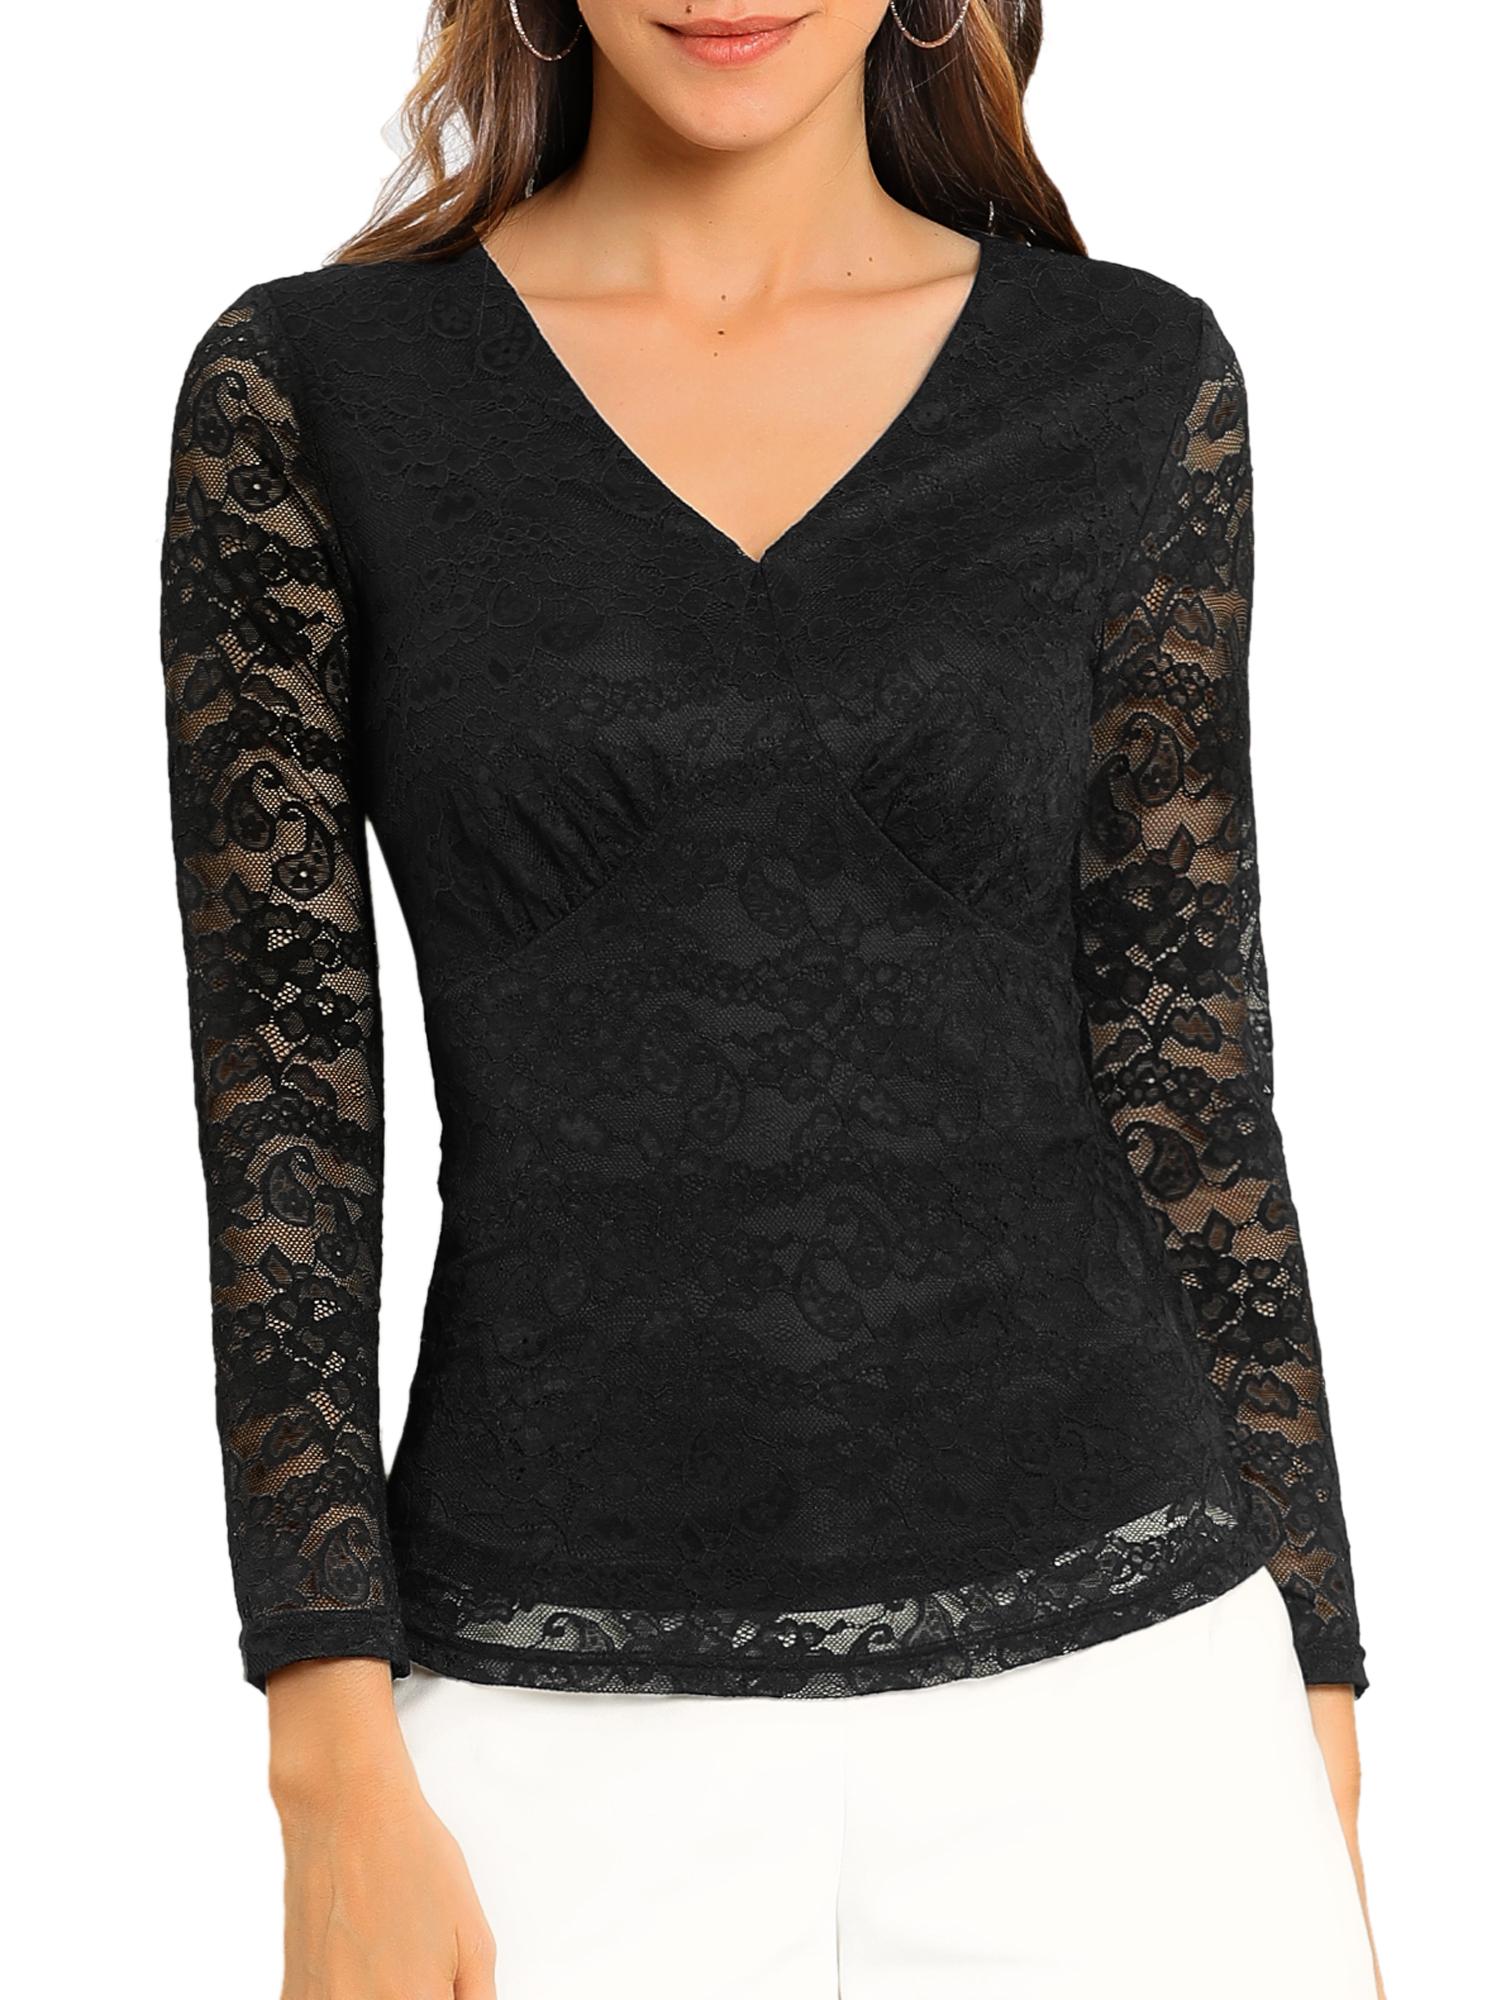 Allegra K Women's V Neck Slim Fit Lined Long Sleeve Lace Top Black XS